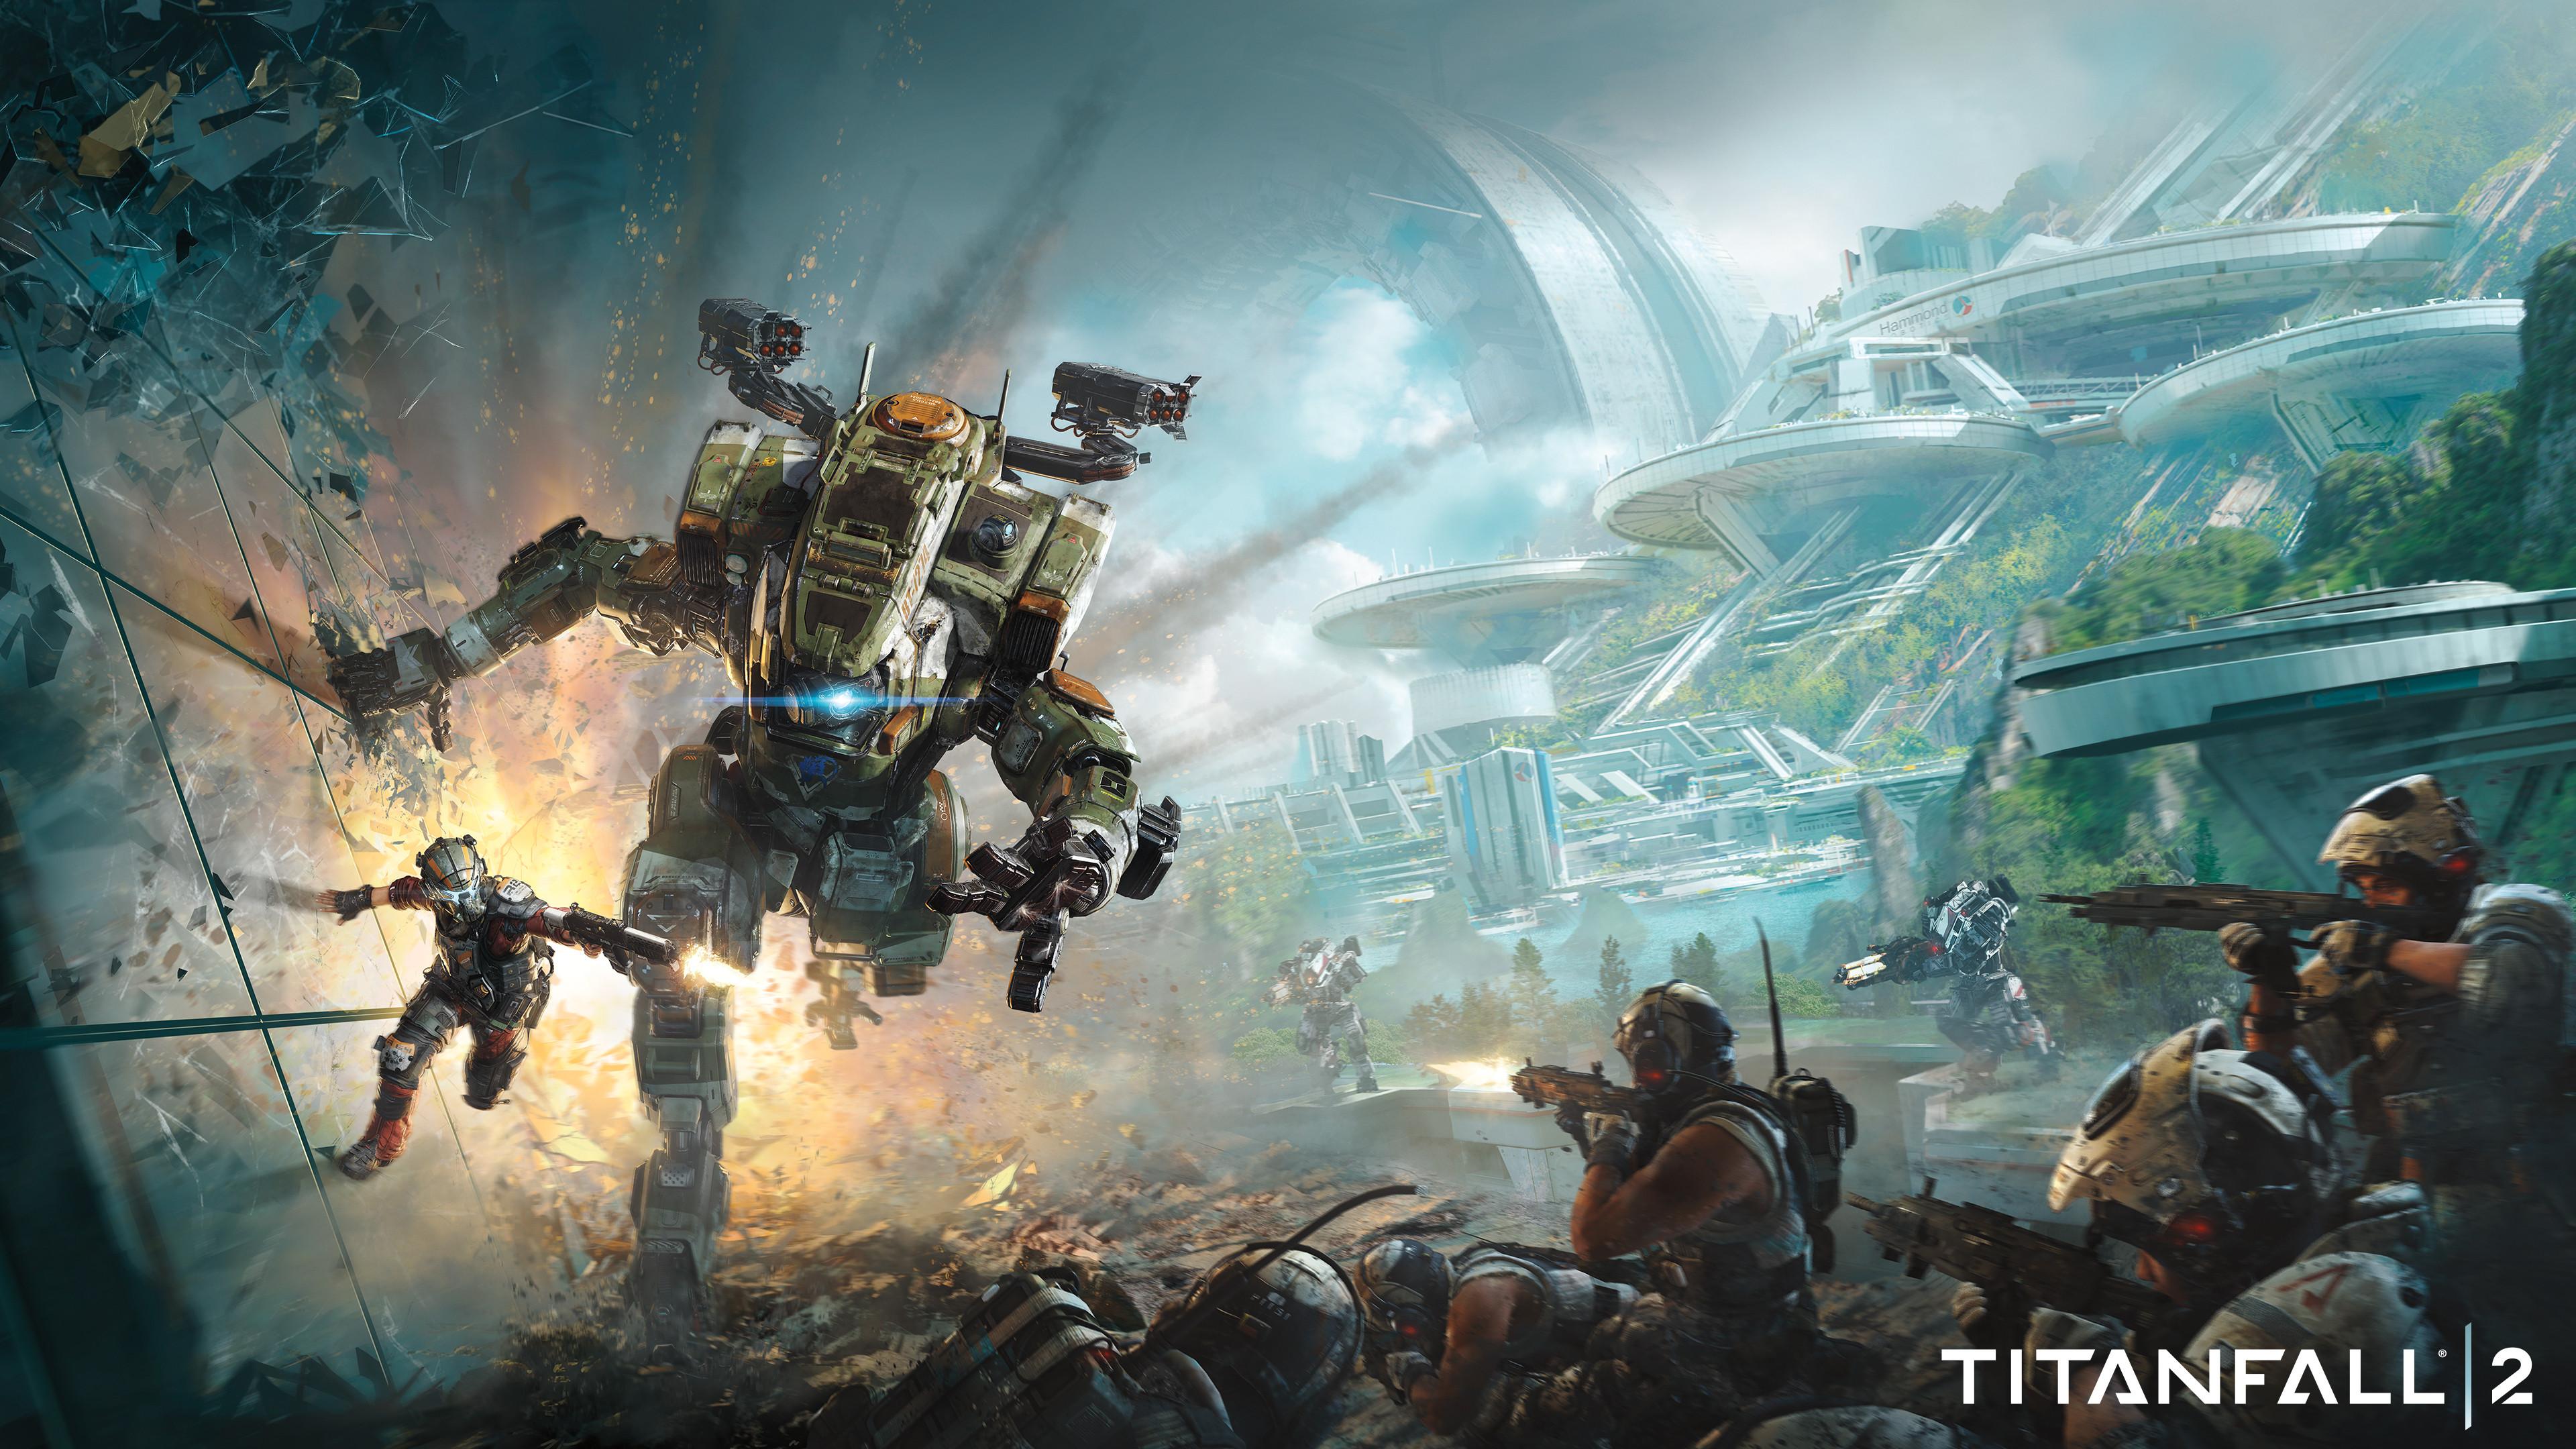 titanfall 2 4k 2016 1536010151 - Titanfall 2 4k 2016 - titanfall 2 wallpapers, games wallpapers, 4k-wallpapers, 2016 games wallpapers